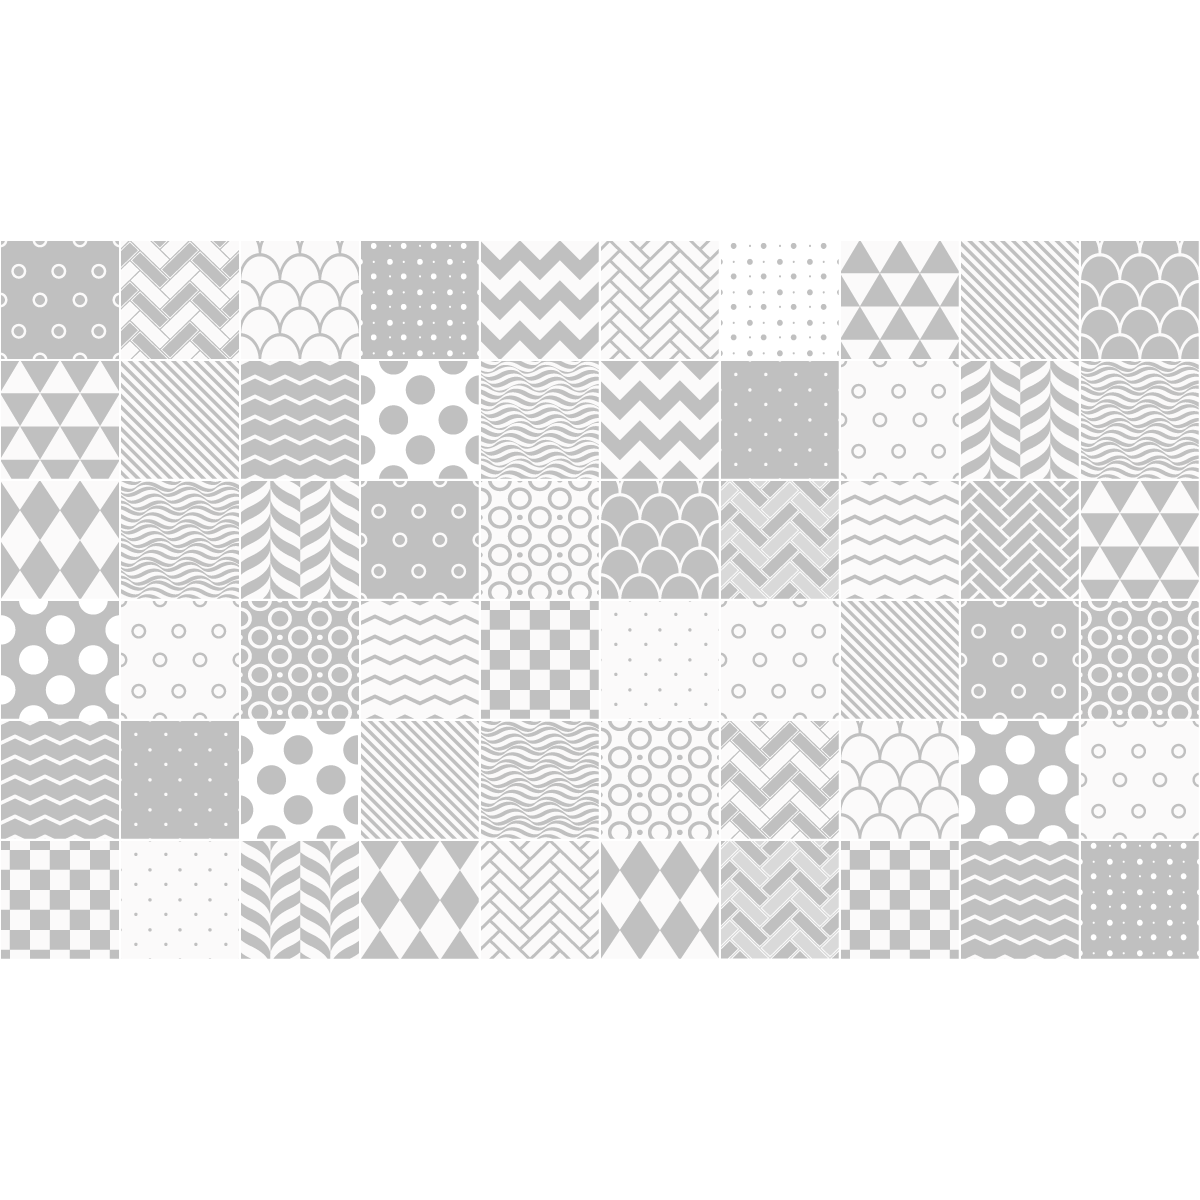 60 stickers carreaux de ciment scandinave cardiff cuisine carrelages ambiance sticker. Black Bedroom Furniture Sets. Home Design Ideas